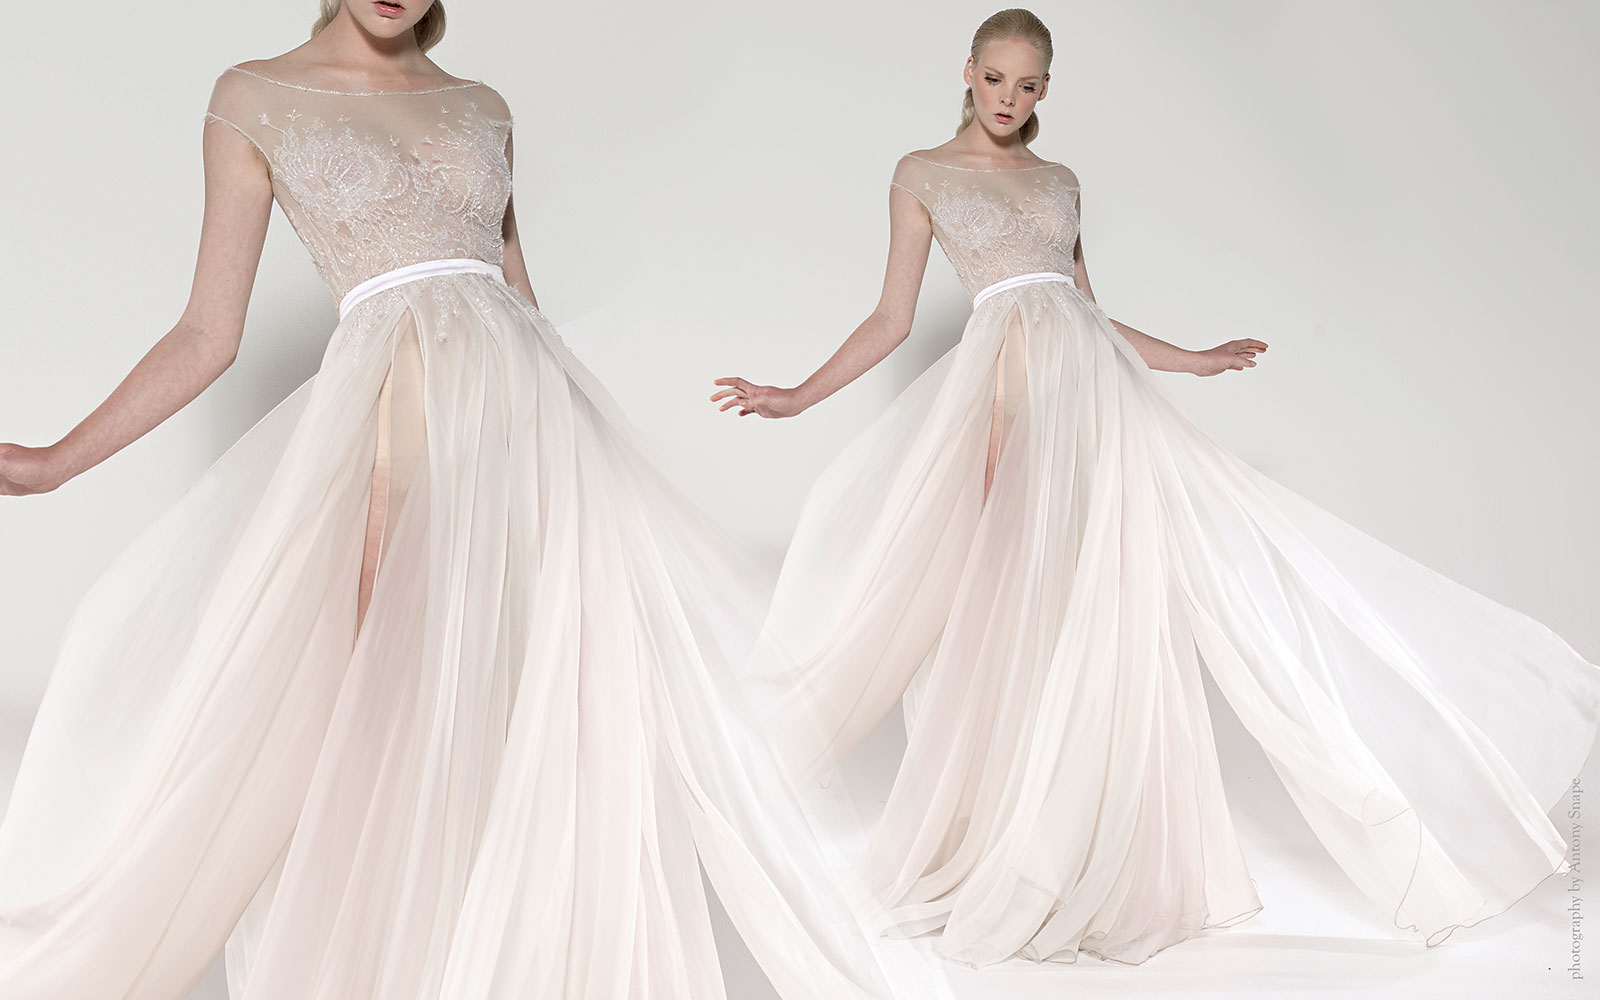 2012 13 ss couture paolo sebastian for Paolo sebastian wedding dresses